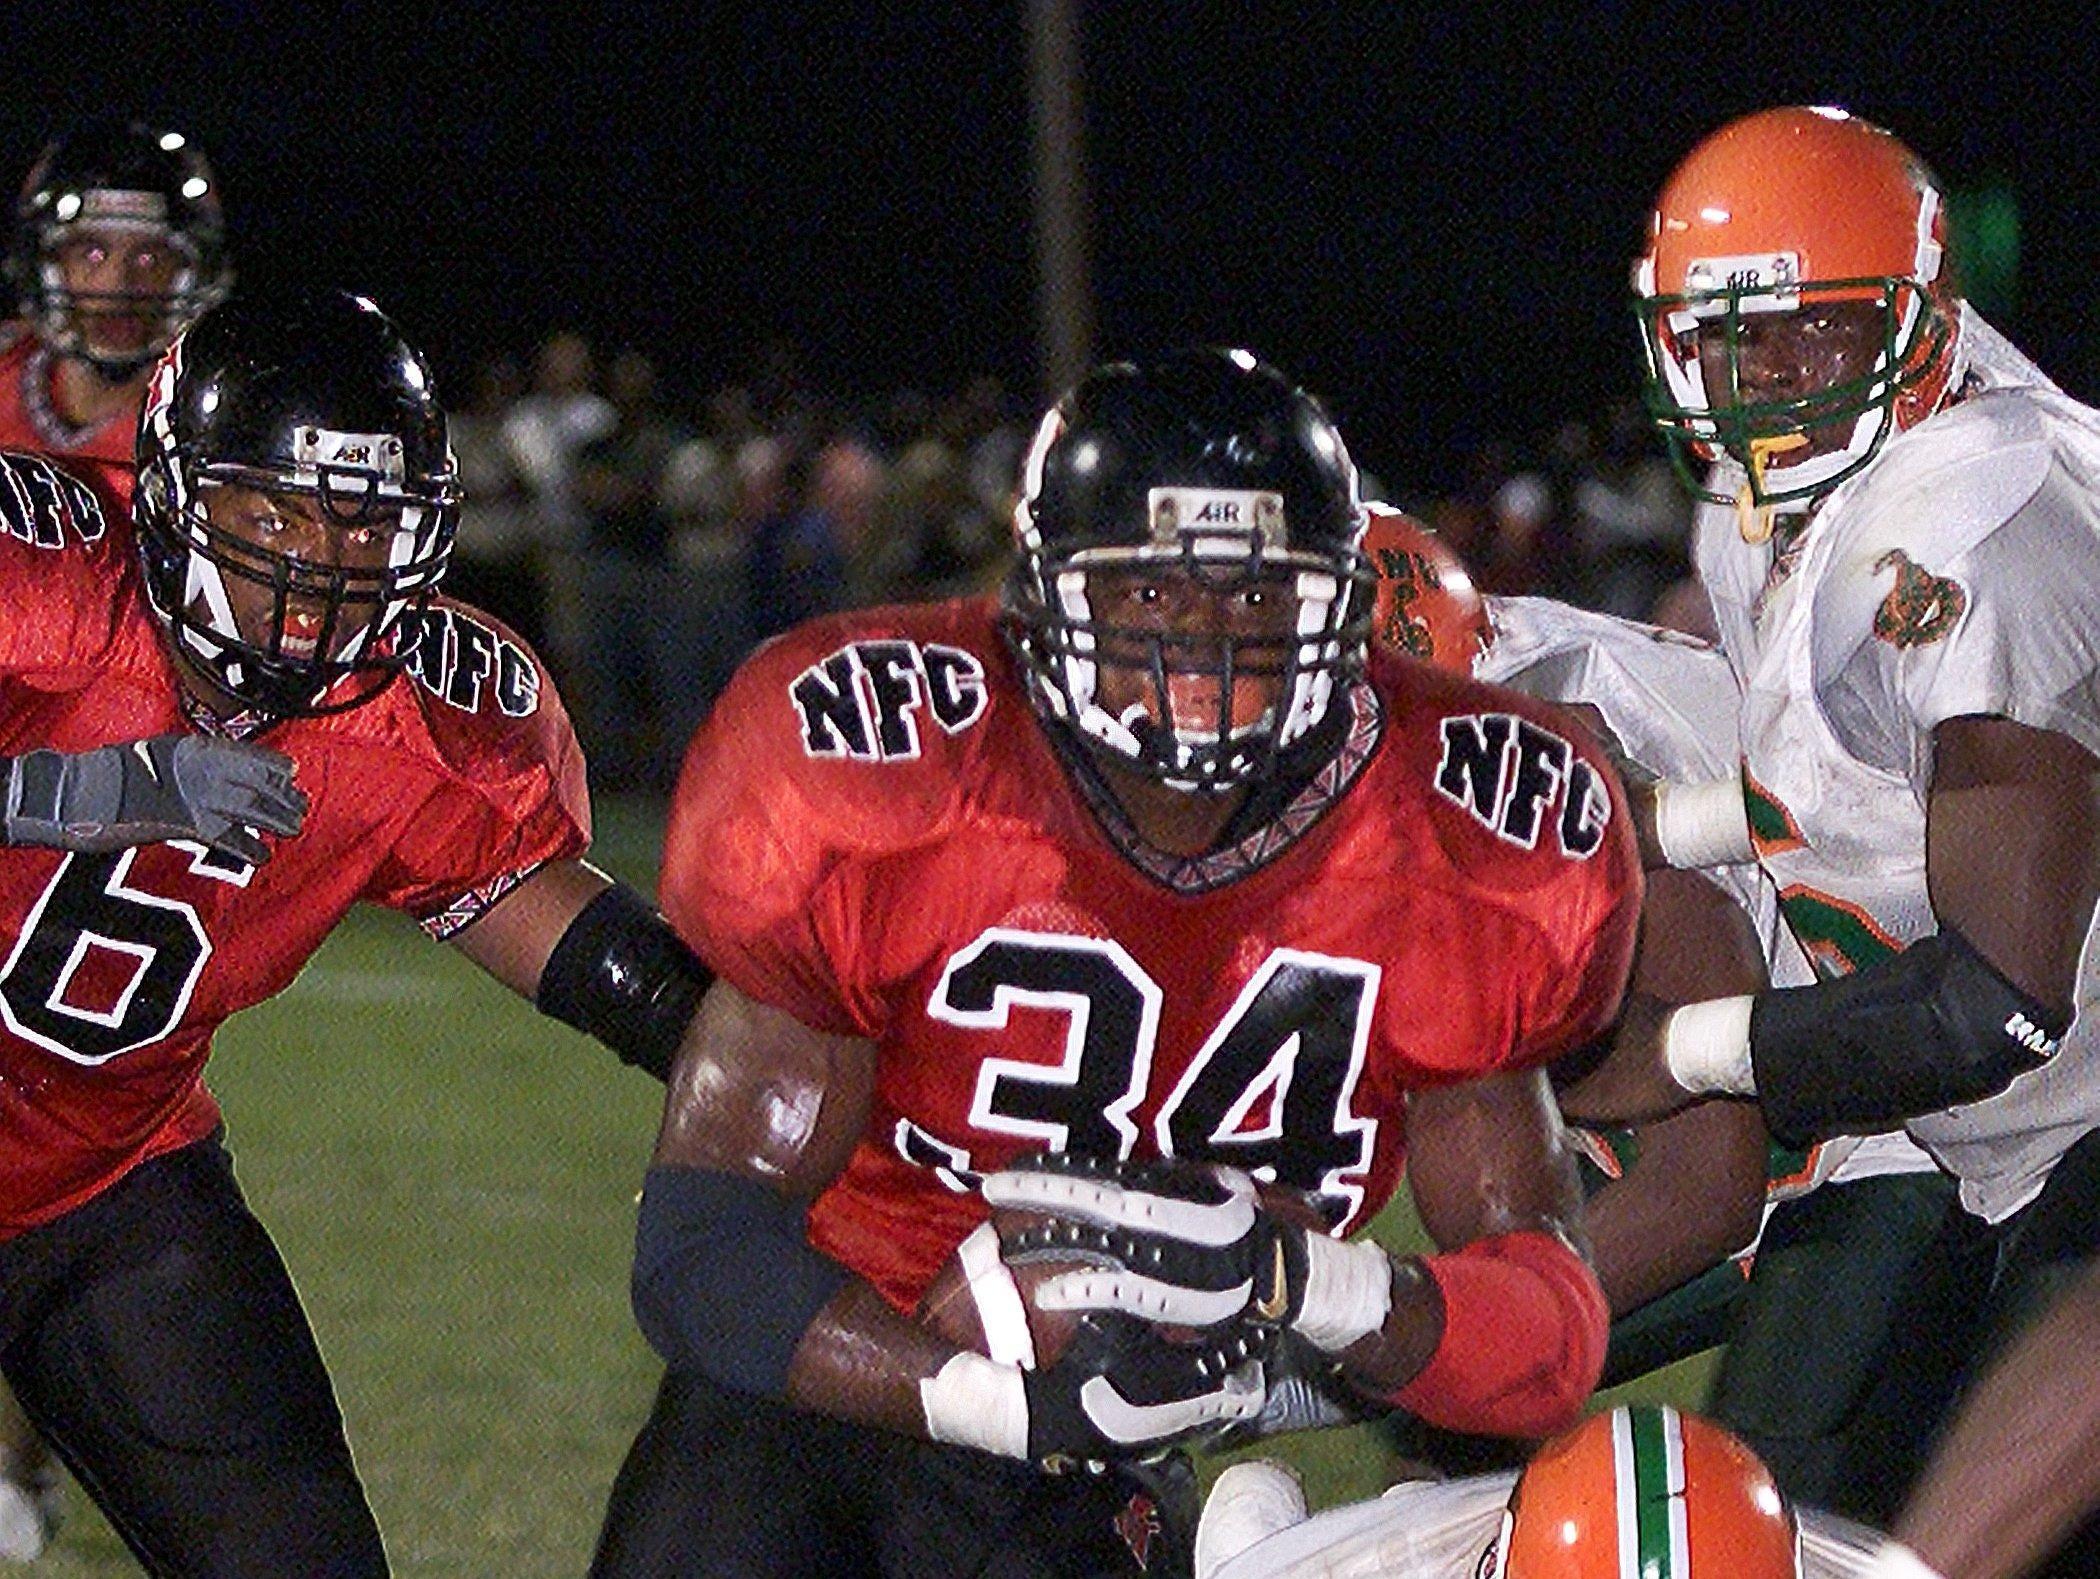 North Florida Christian's Ernie Sims runs towards the endzone against FAMU High on Oct. 12, 2001.